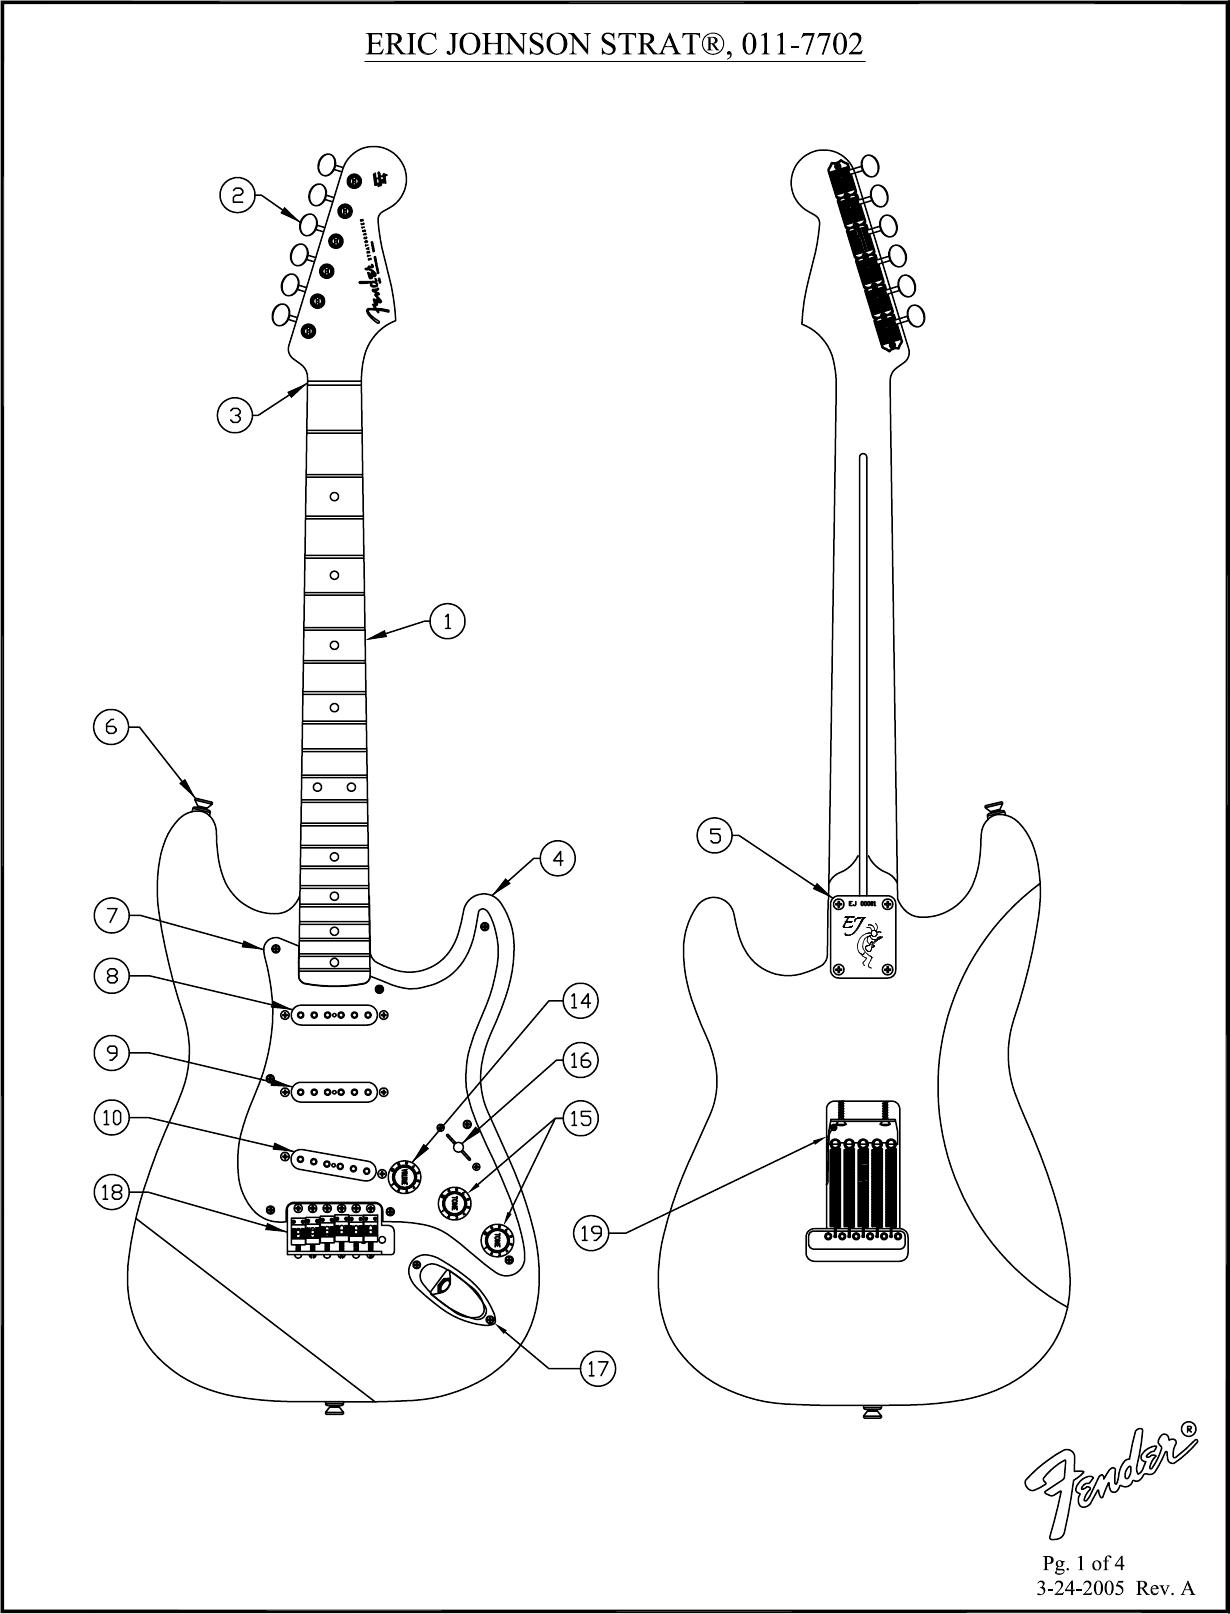 Page 1 of 4 - Fender SD 011-7702 Eric Johnson Strat - Rev A  011-7702A SISD